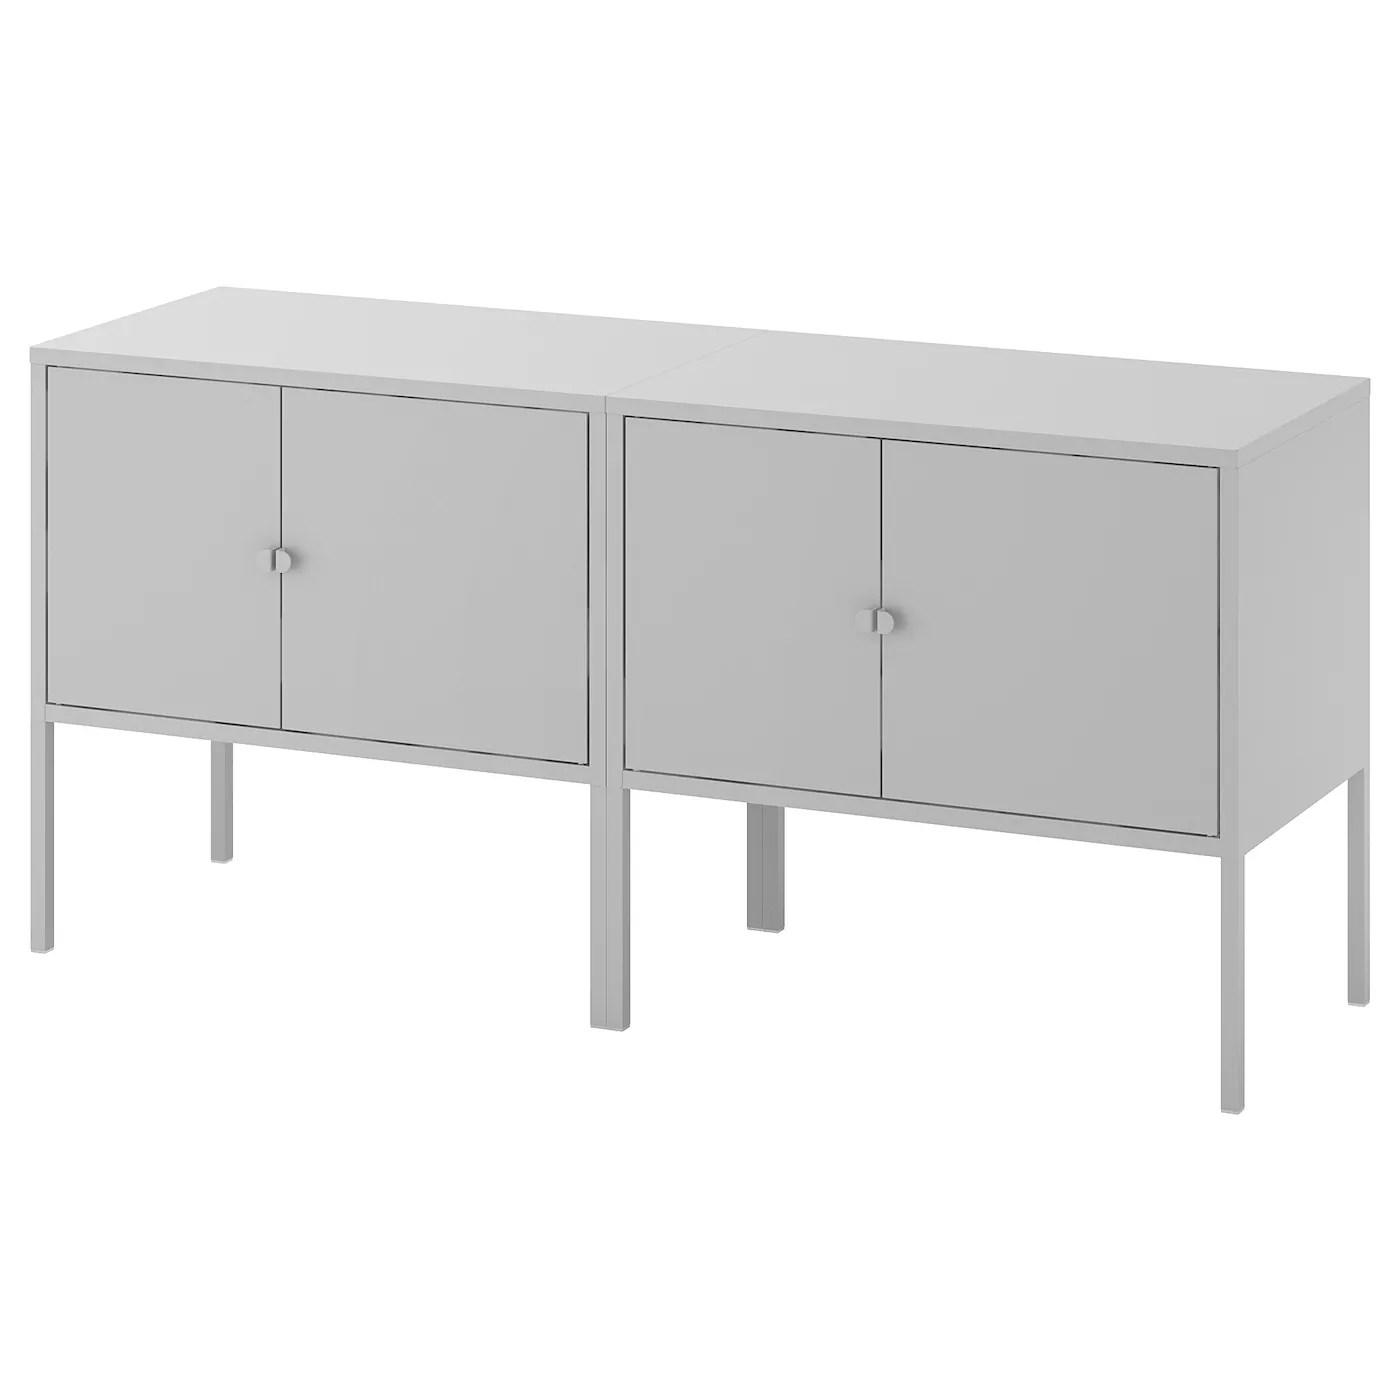 Meuble De Rangement Pas Cher Ikea